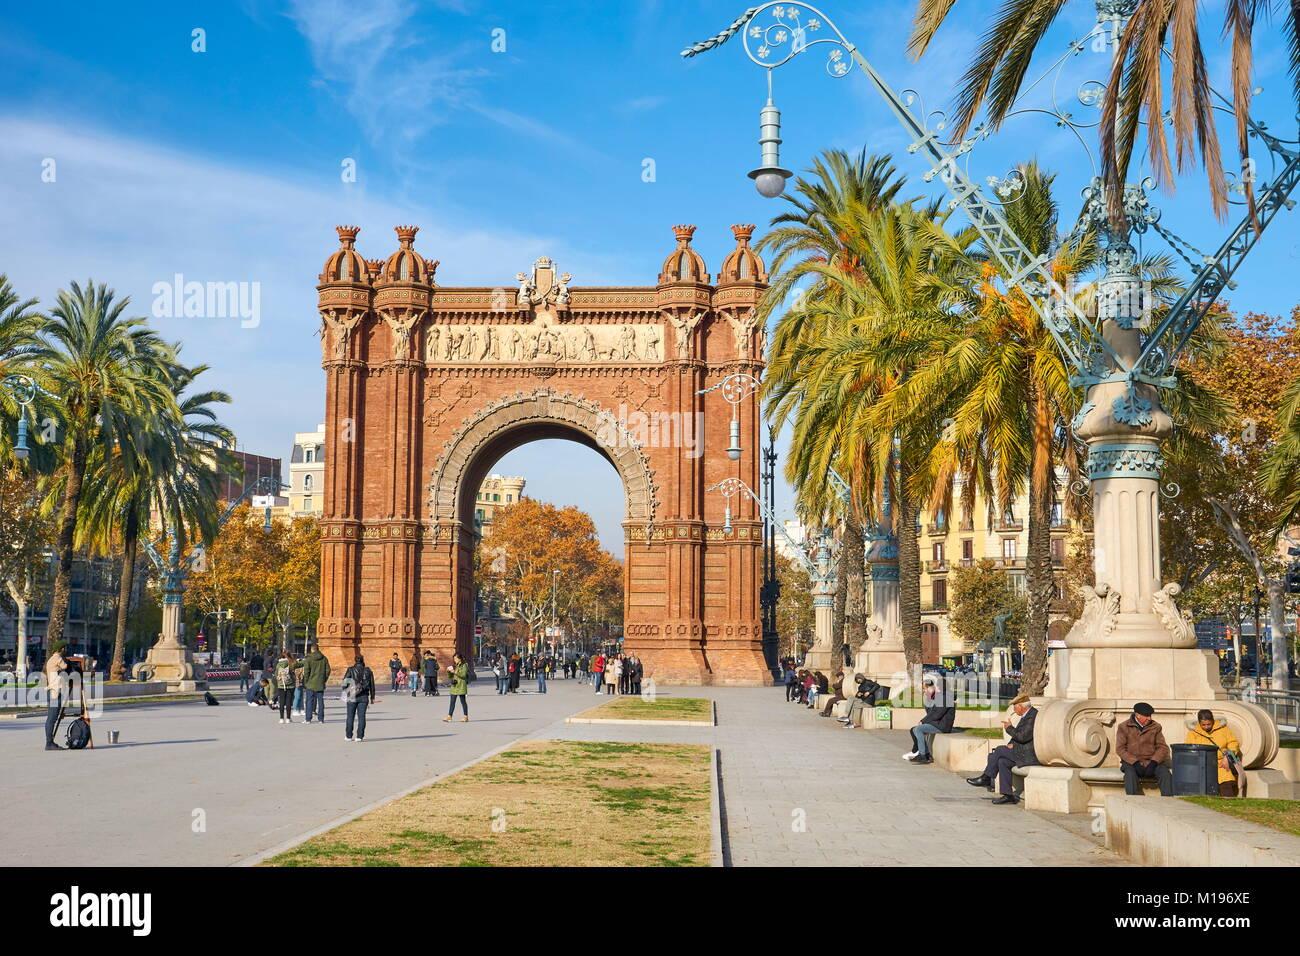 Arc de Triomf or Arco de Triunfo, Barcelona, Catalonia, Spain - Stock Image